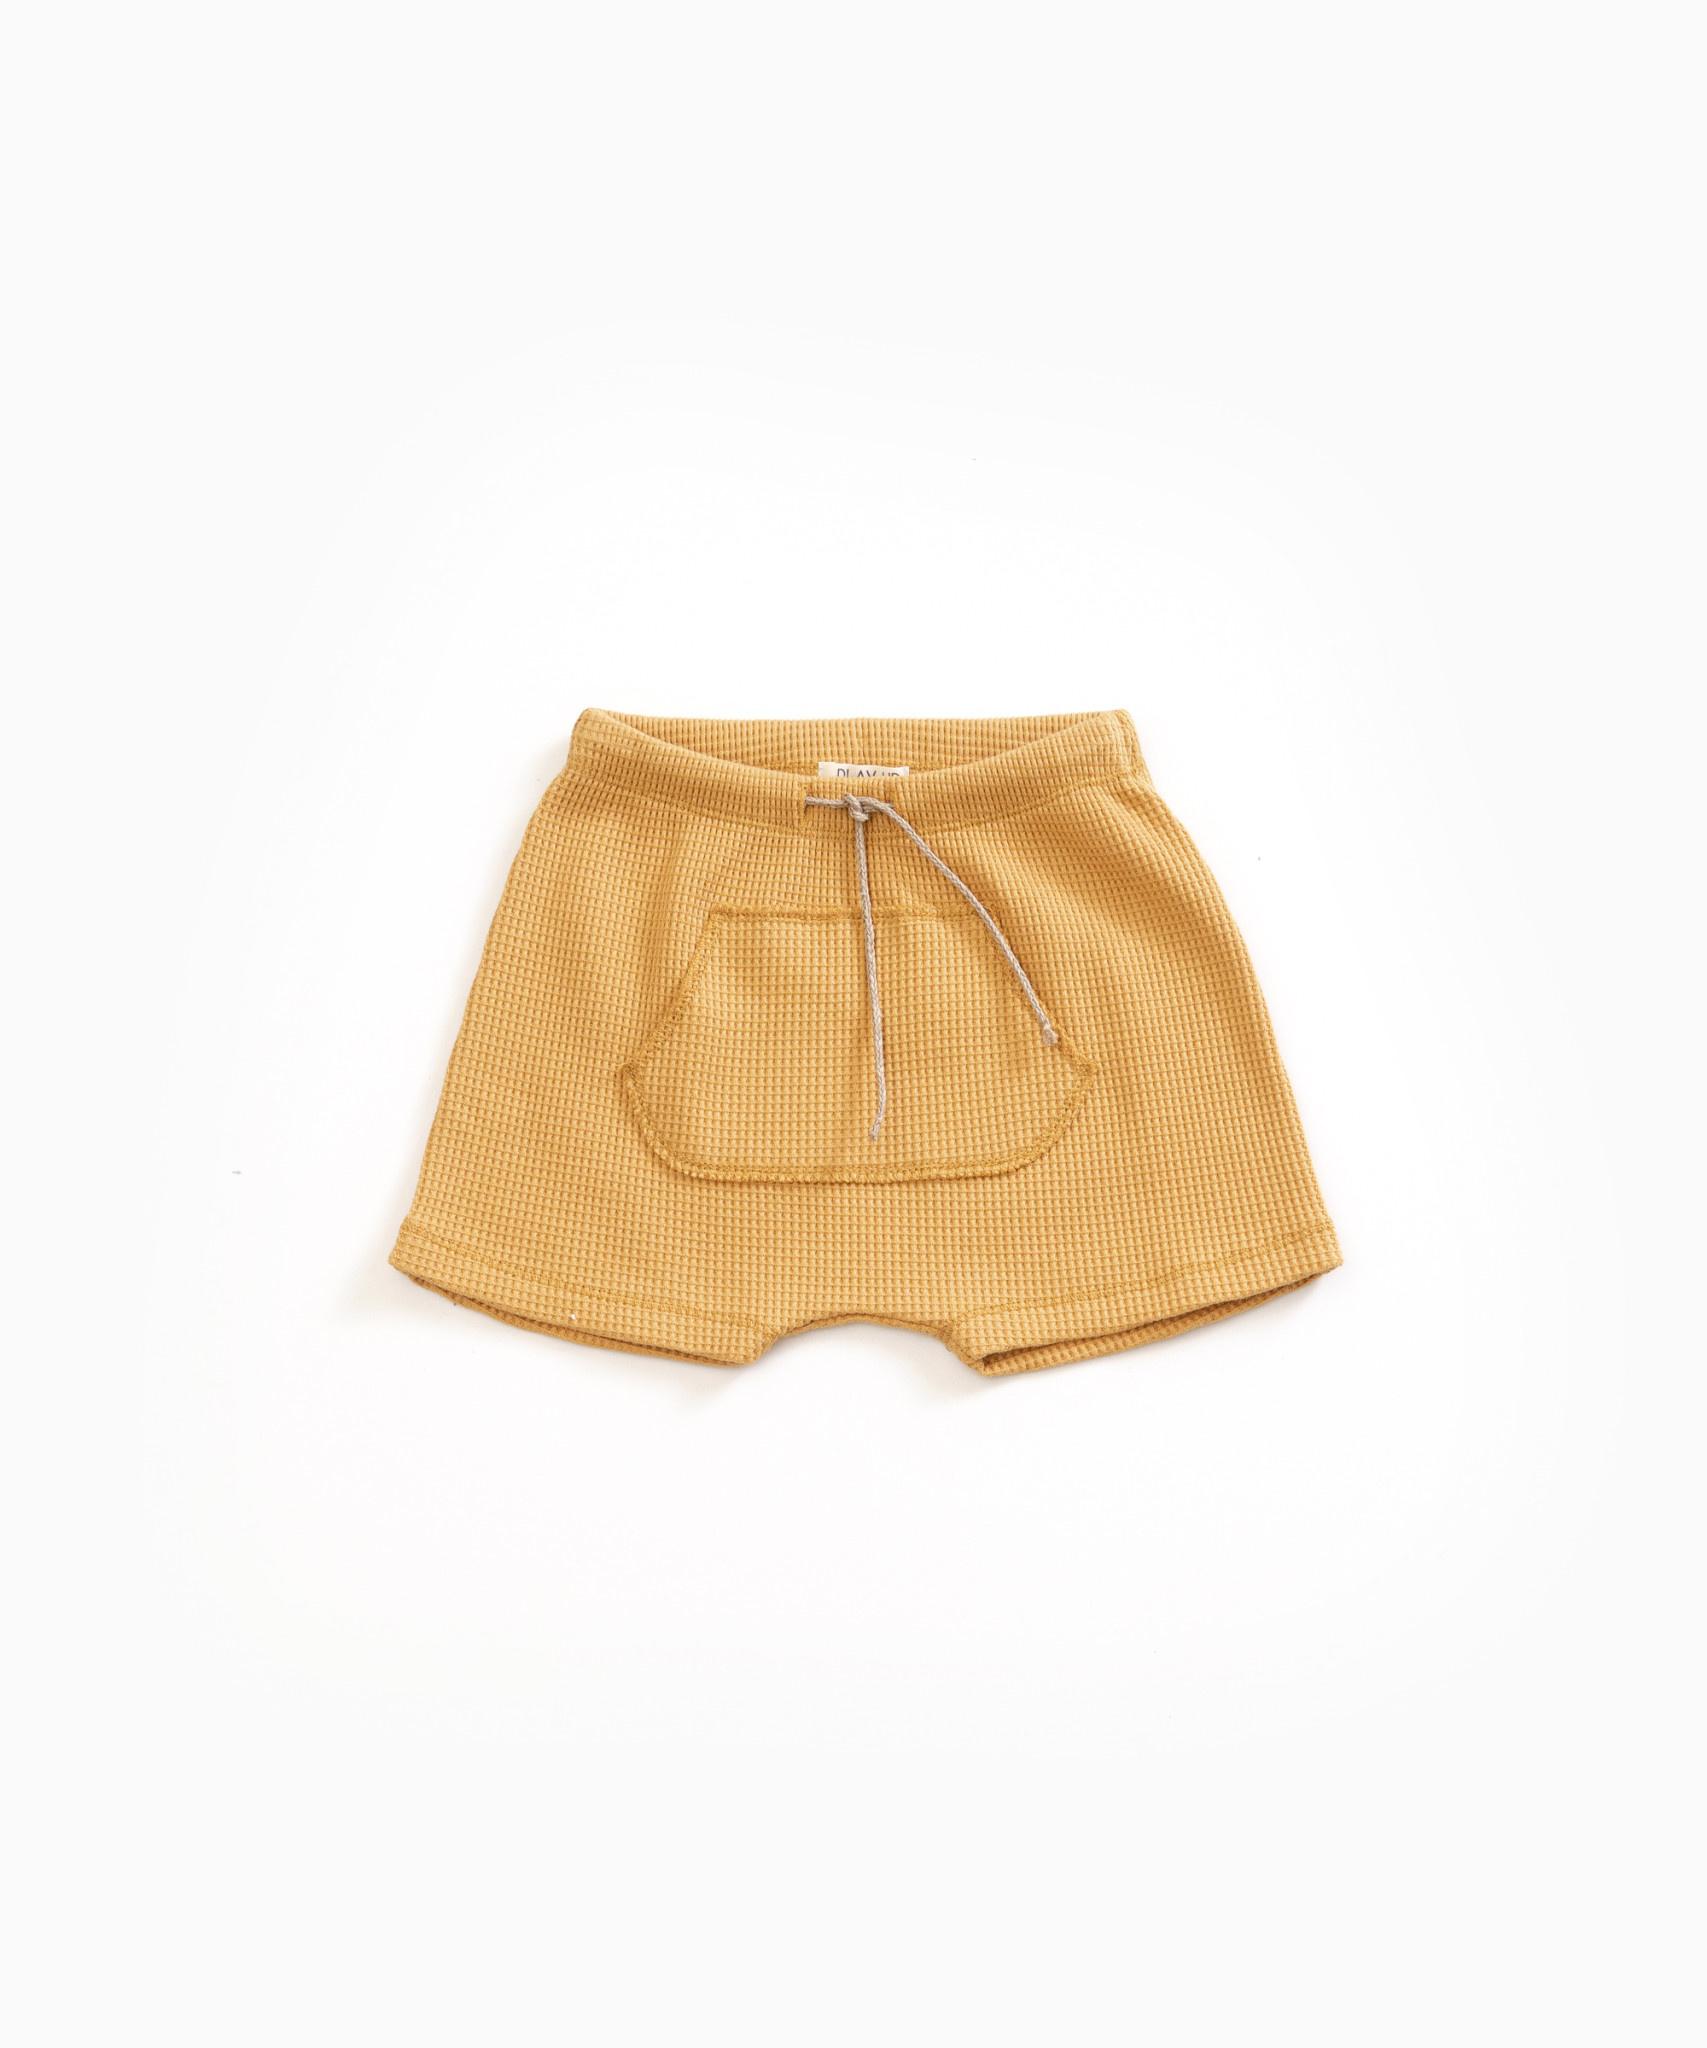 Play-up Shorts with kangaroo pocket in organic cotton | Sea almond